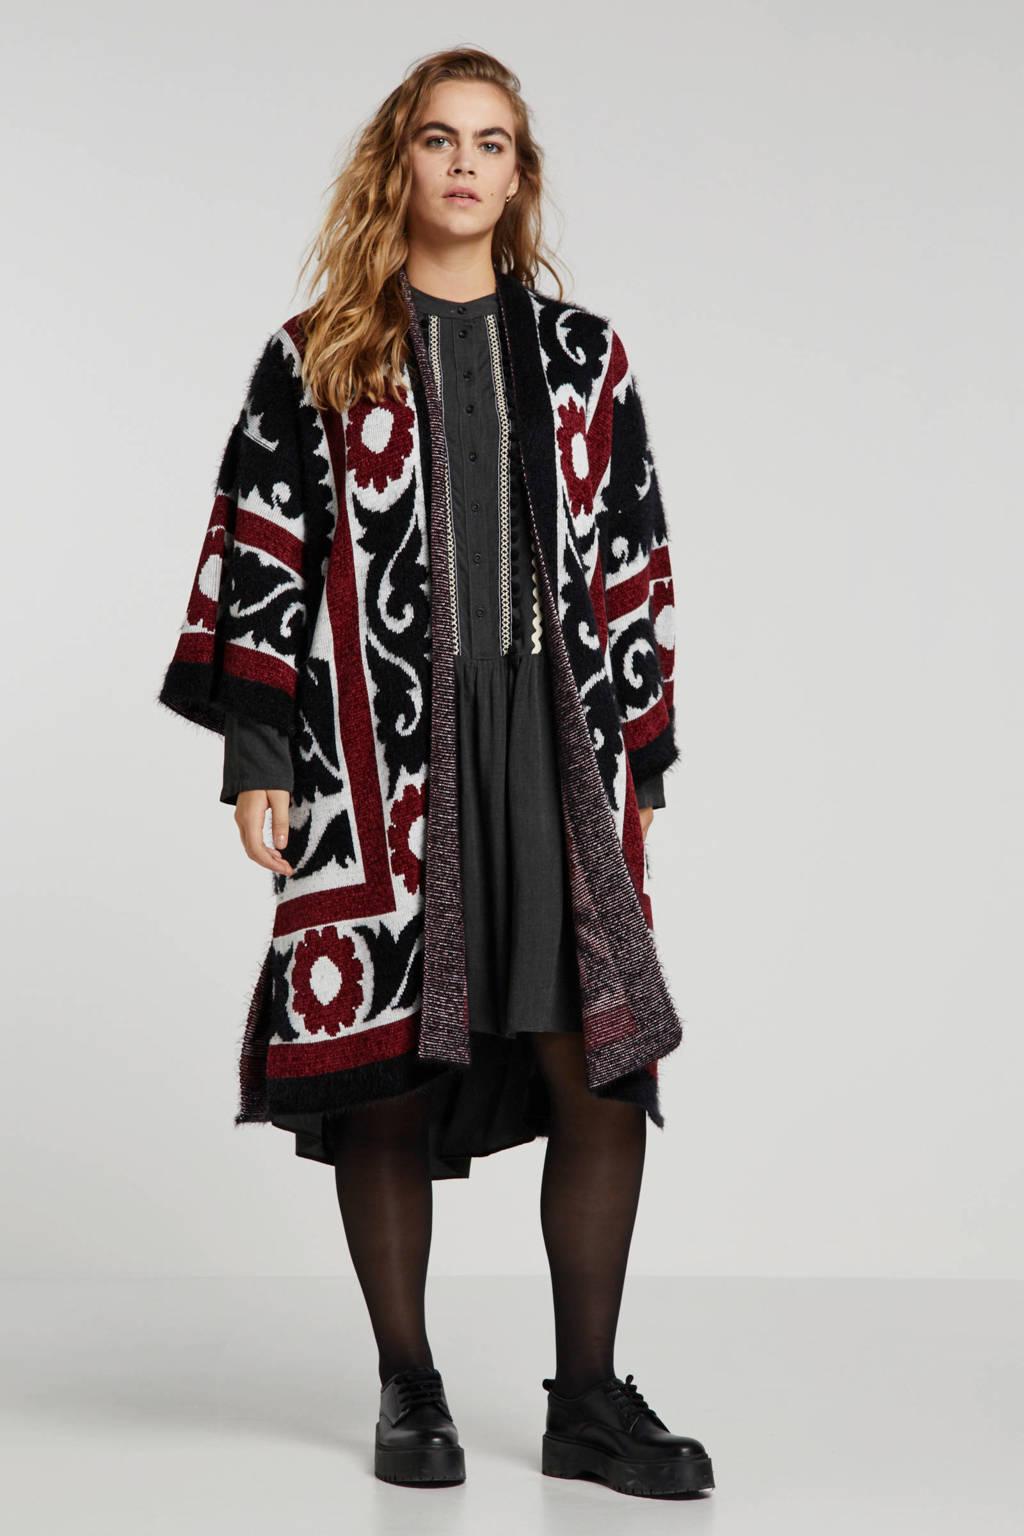 Mat Fashion vest met all over print donkerrood/zwart/wit, Donkerrood/zwart/wit